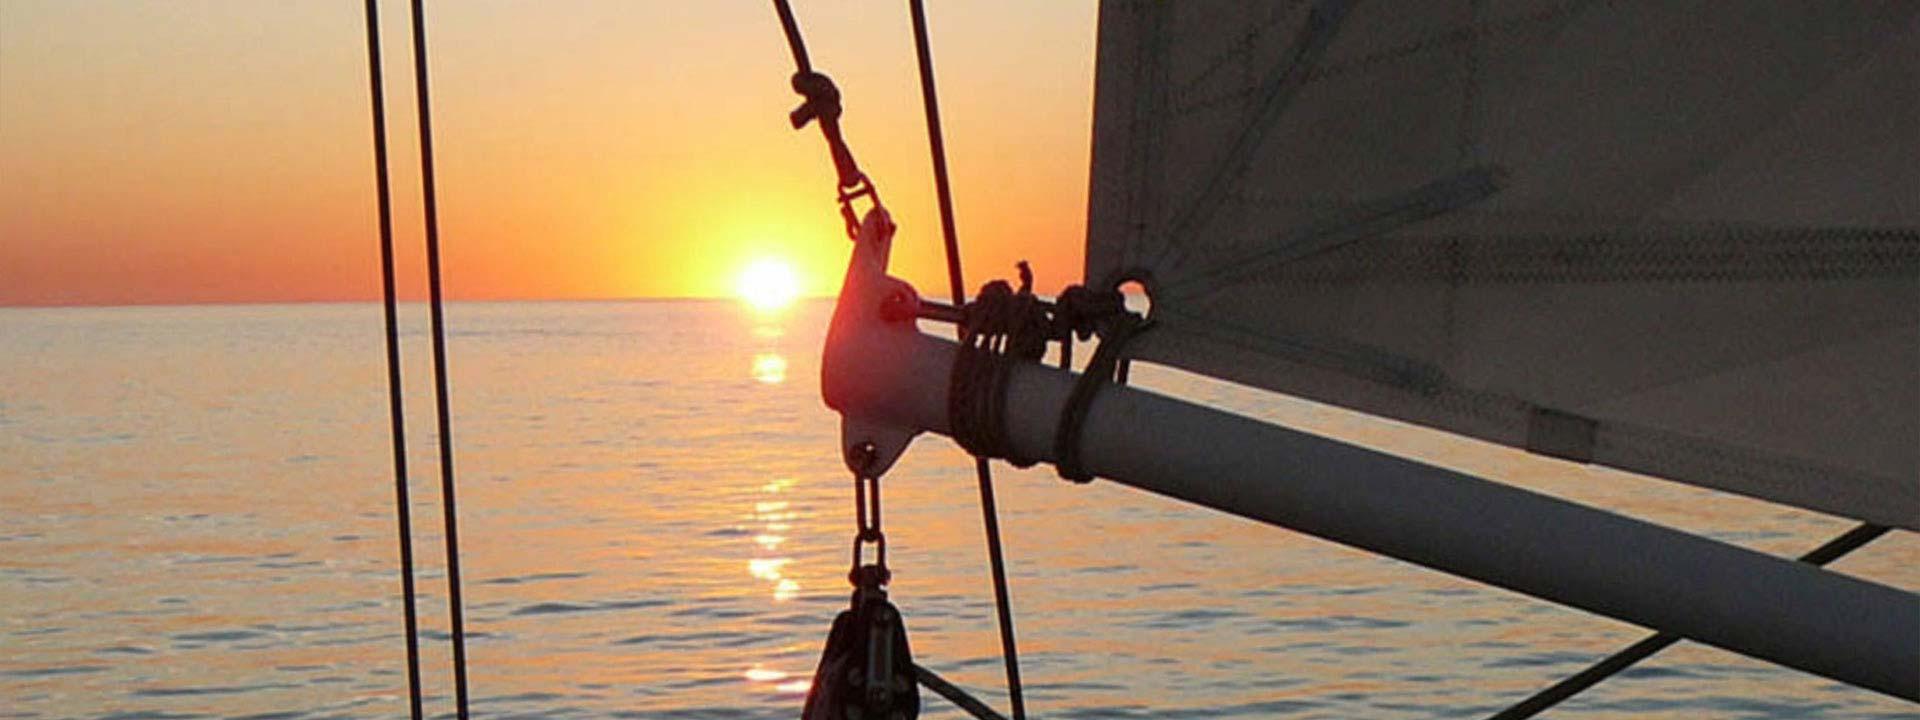 Enjoy a twilight sail with Starsand Yacht Charters